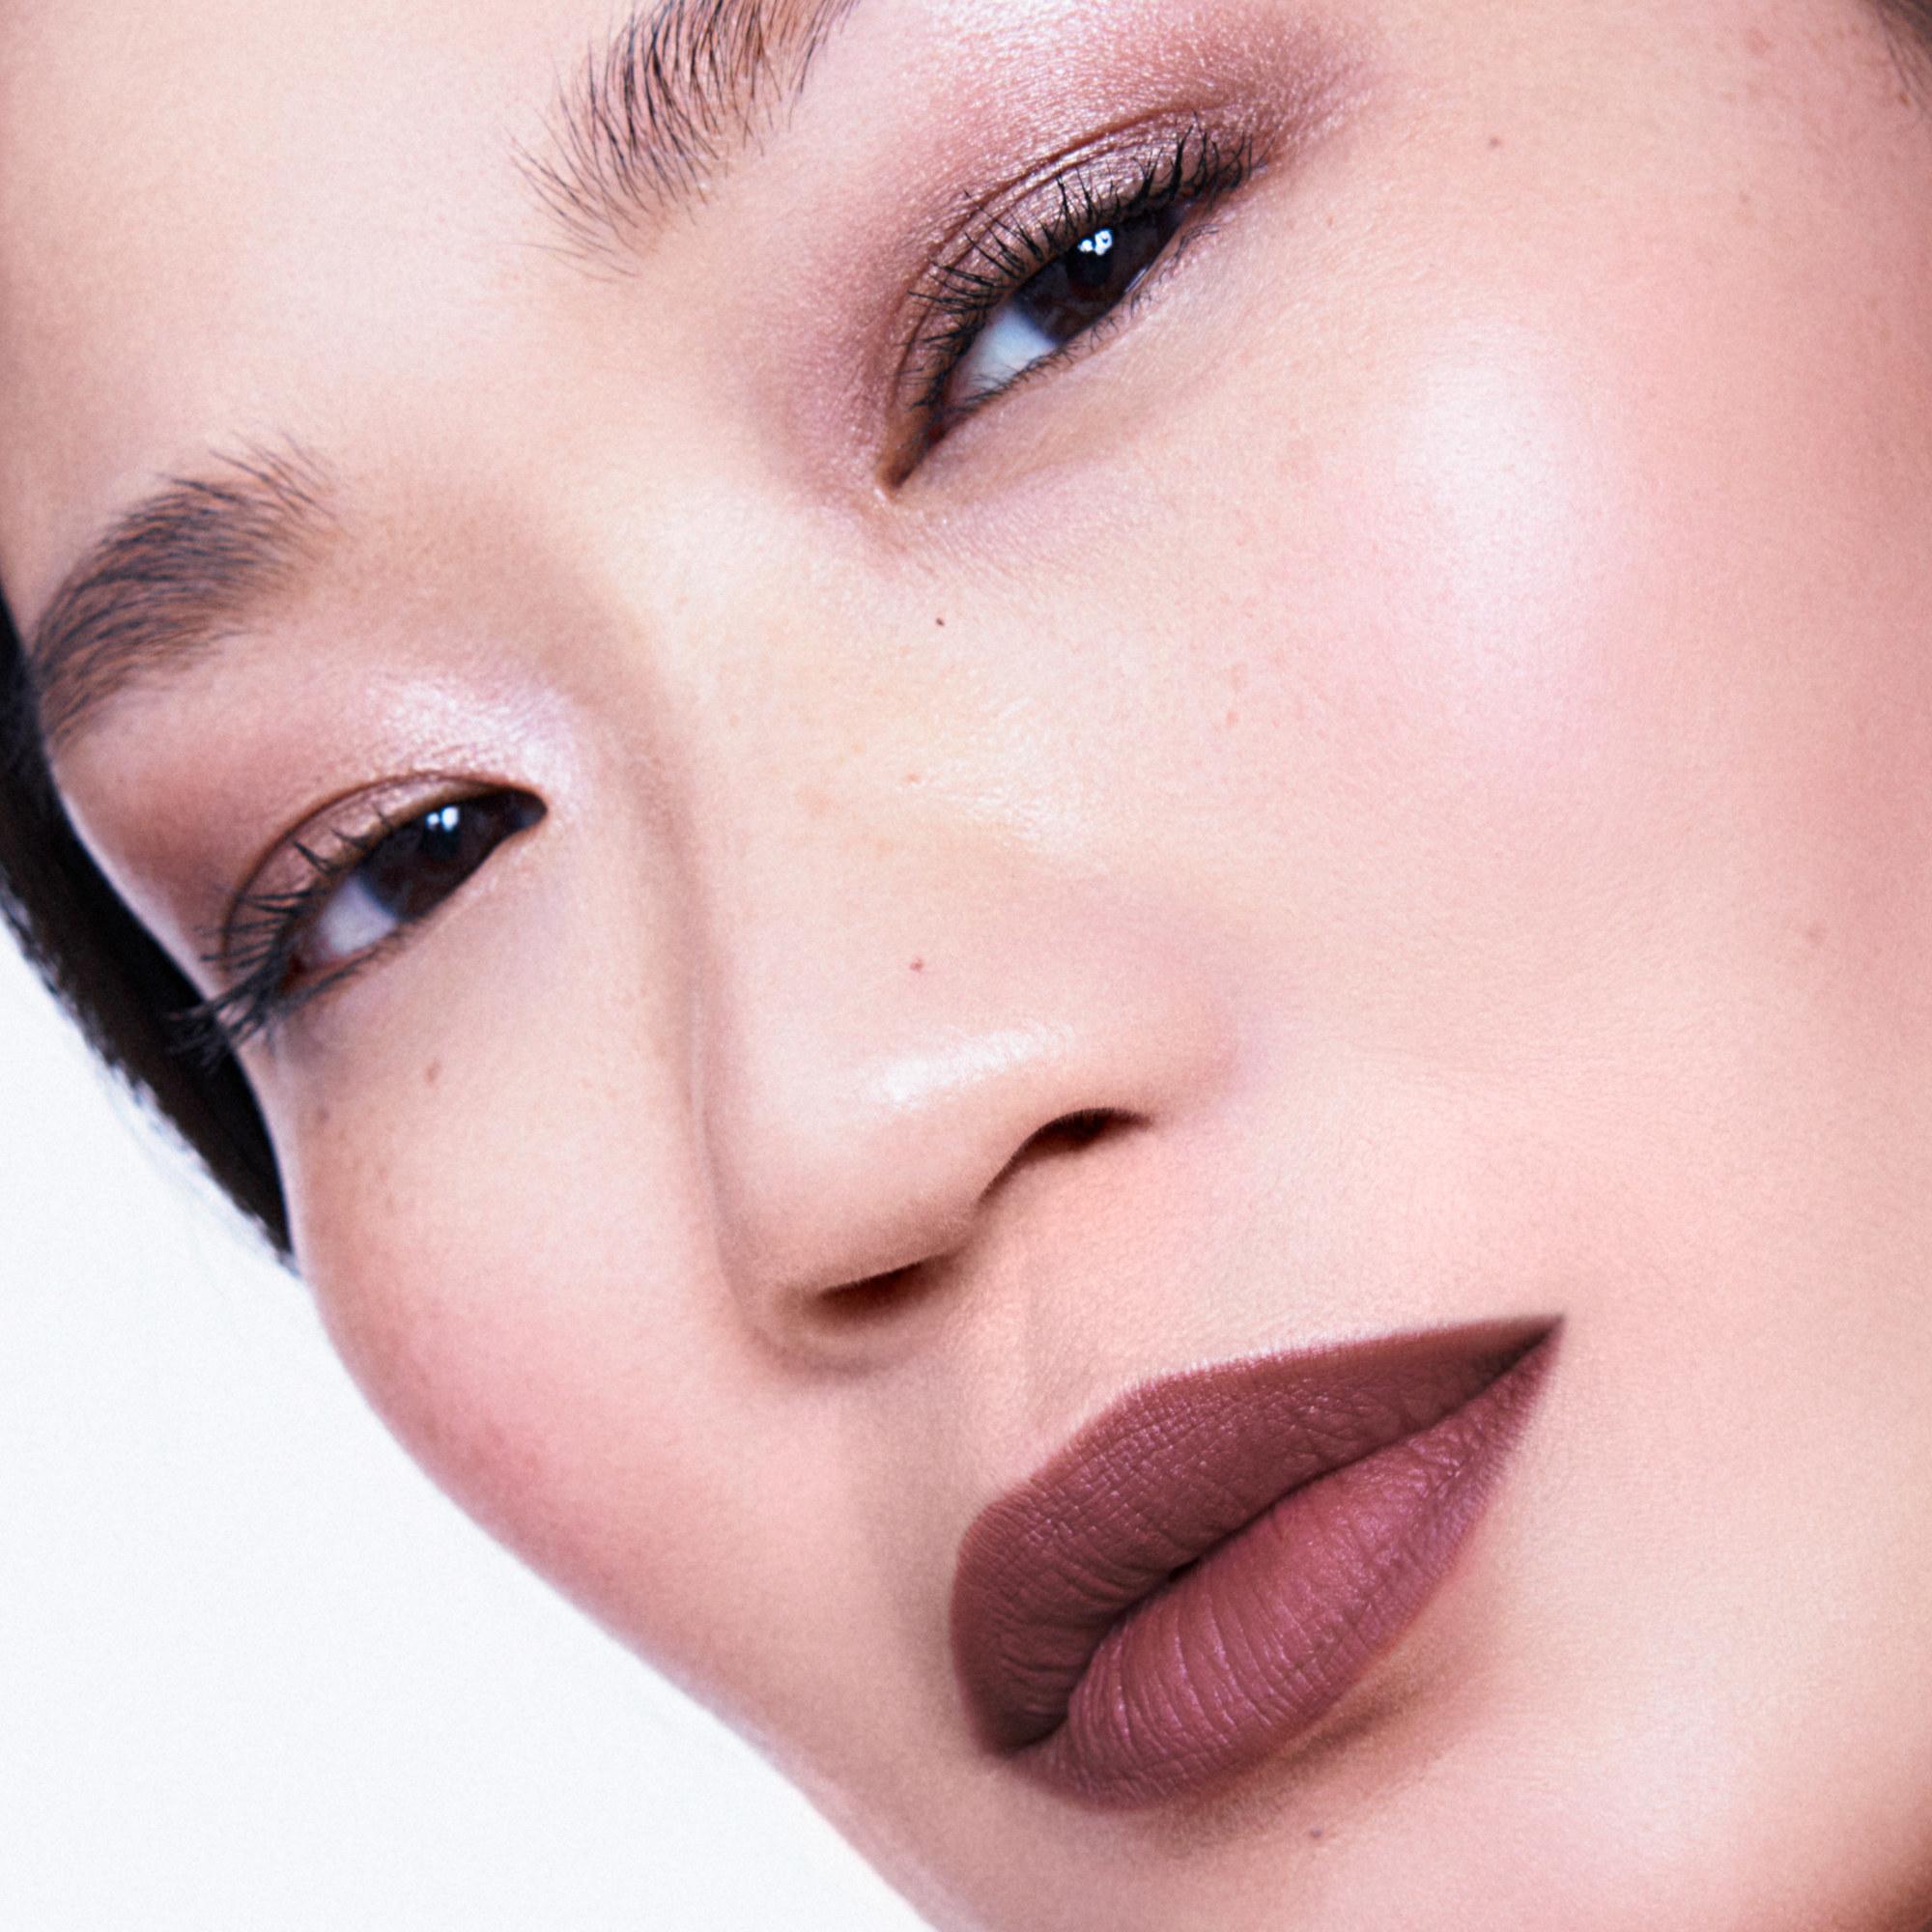 Model wearing Powderstick Matte Lip Crayon close up